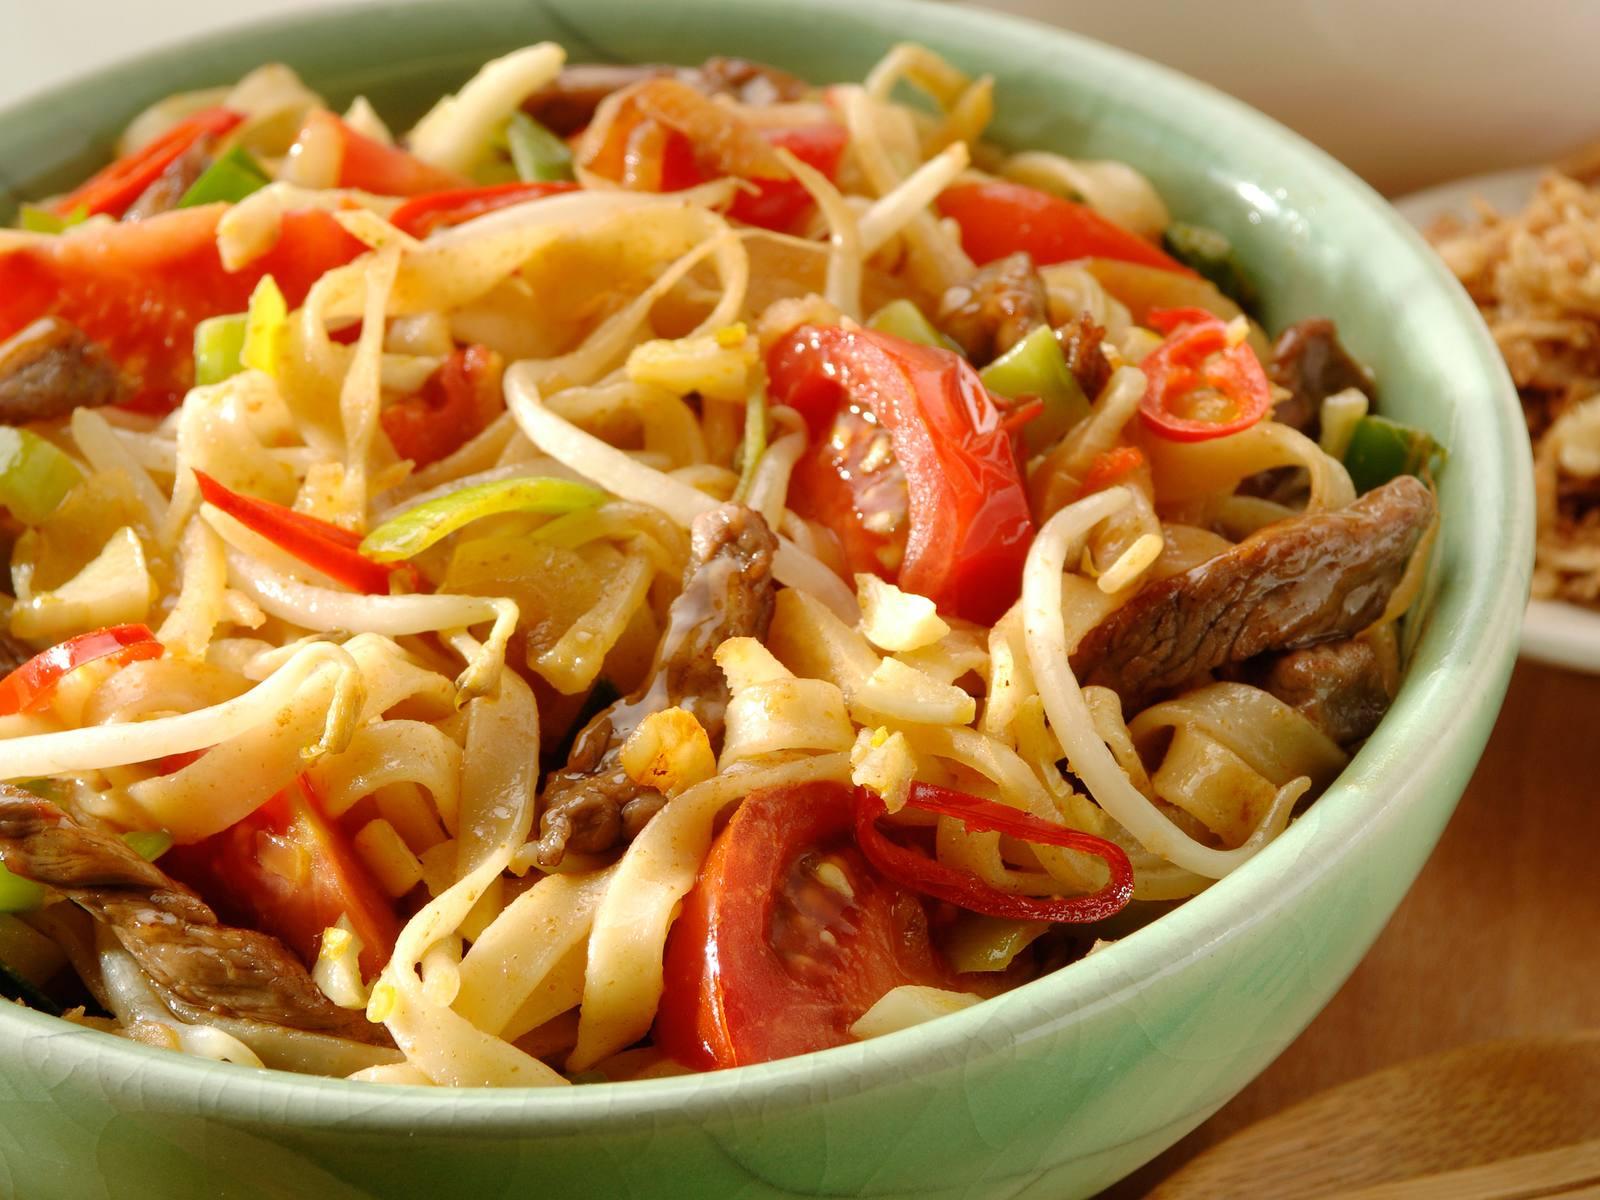 Ketjapmie met tomaat en knoflook